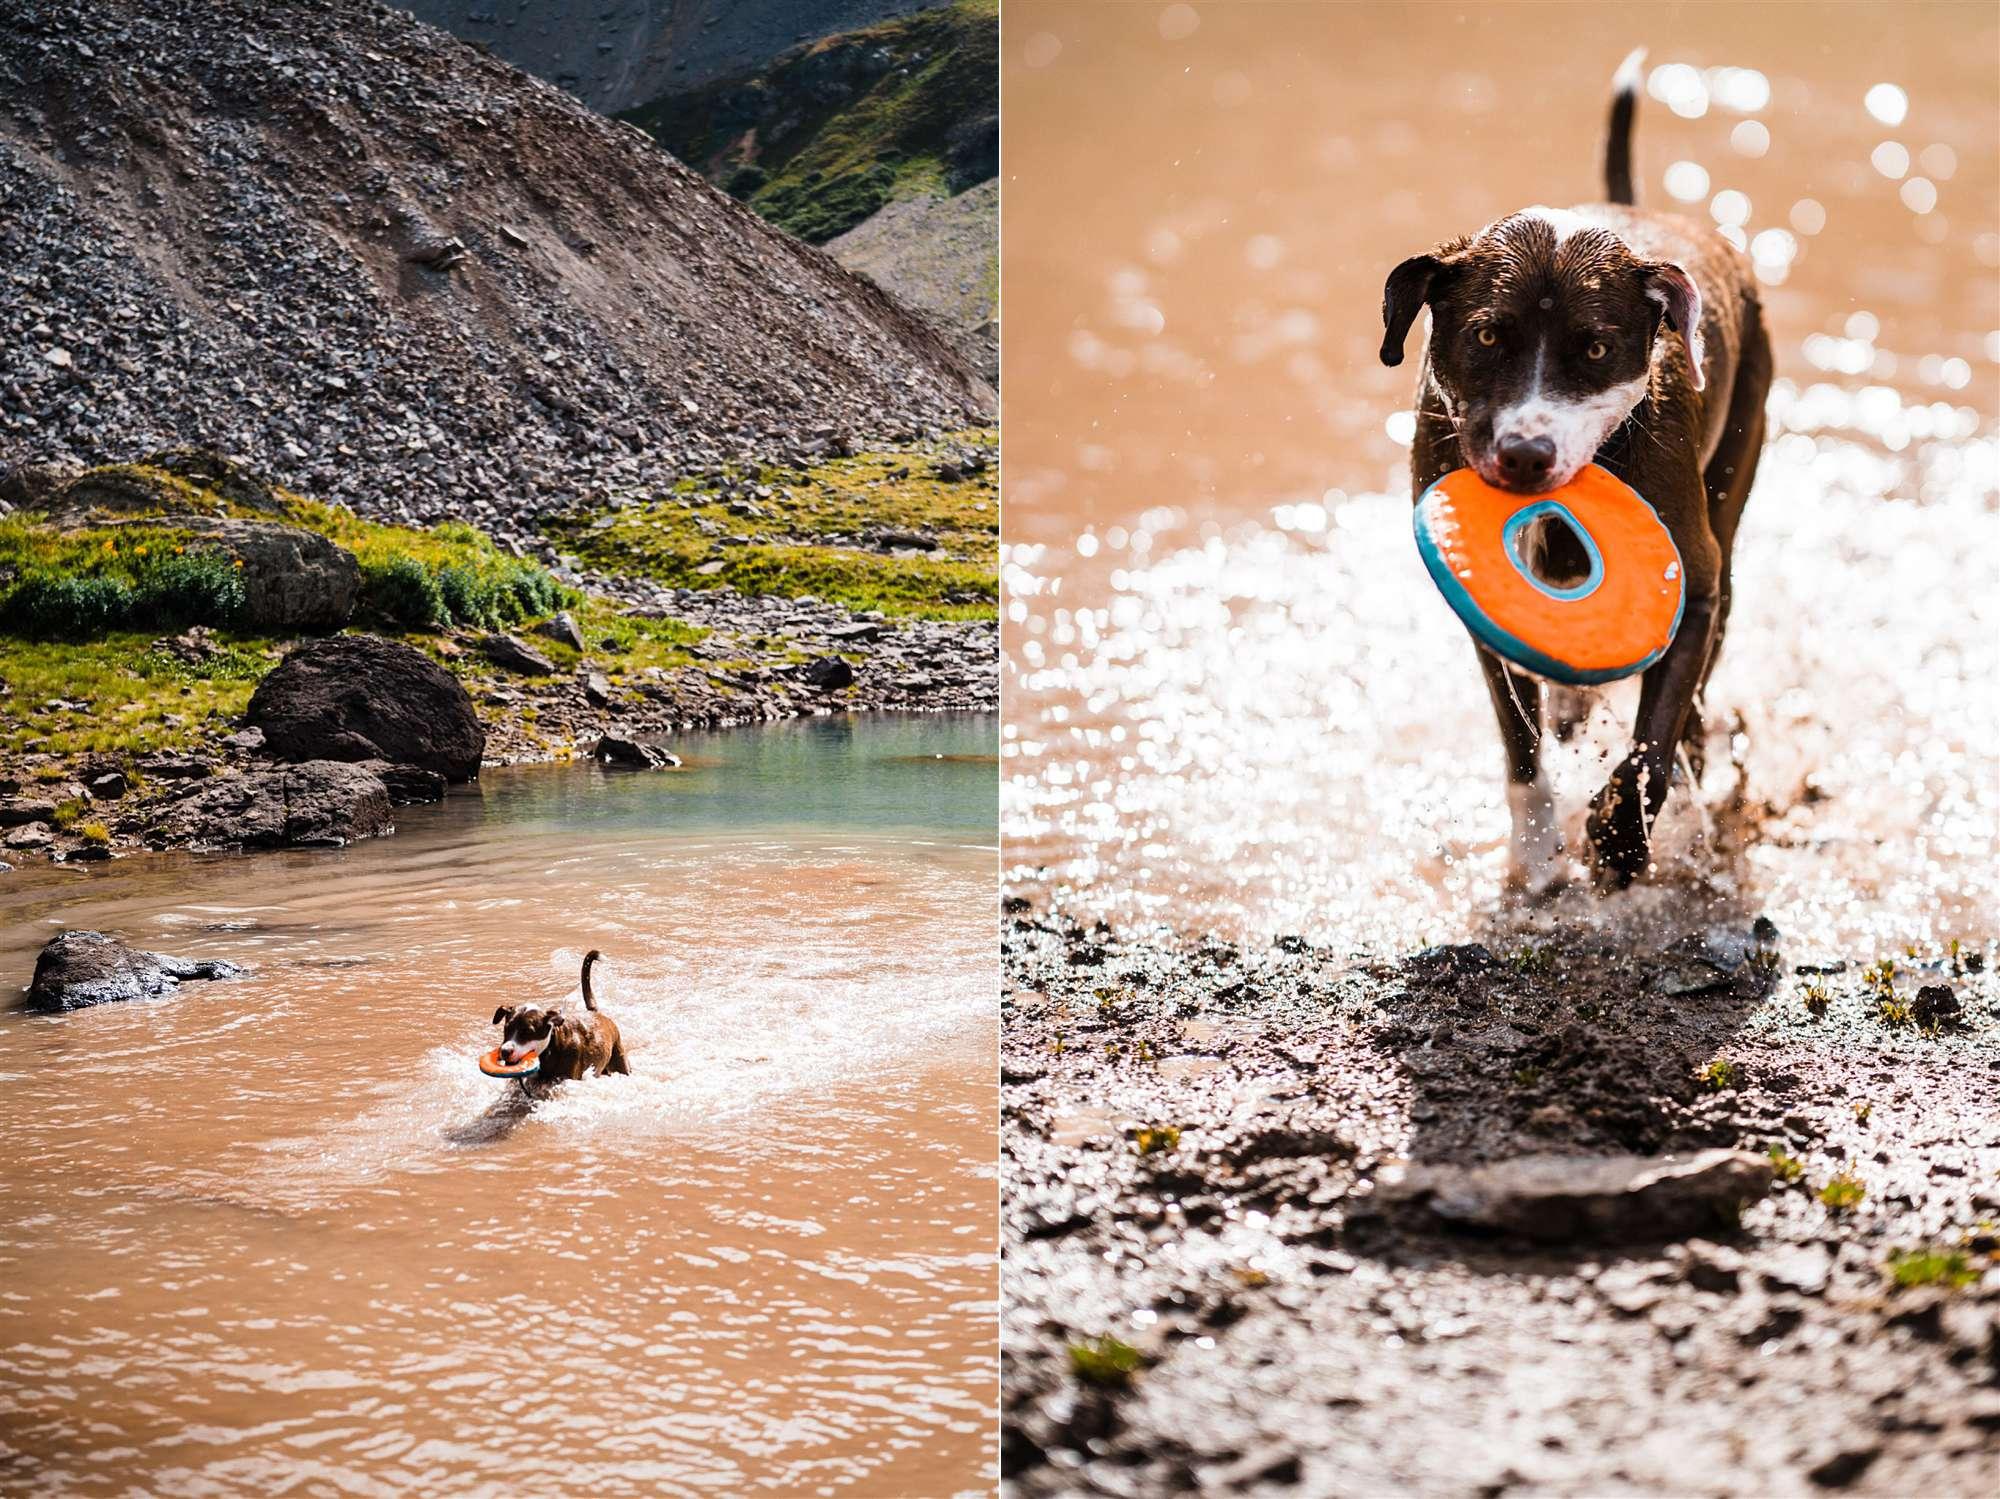 Colorado_Jeeping_Elopement_Emily_Matt_The_Foxes_Photography_0023.jpg